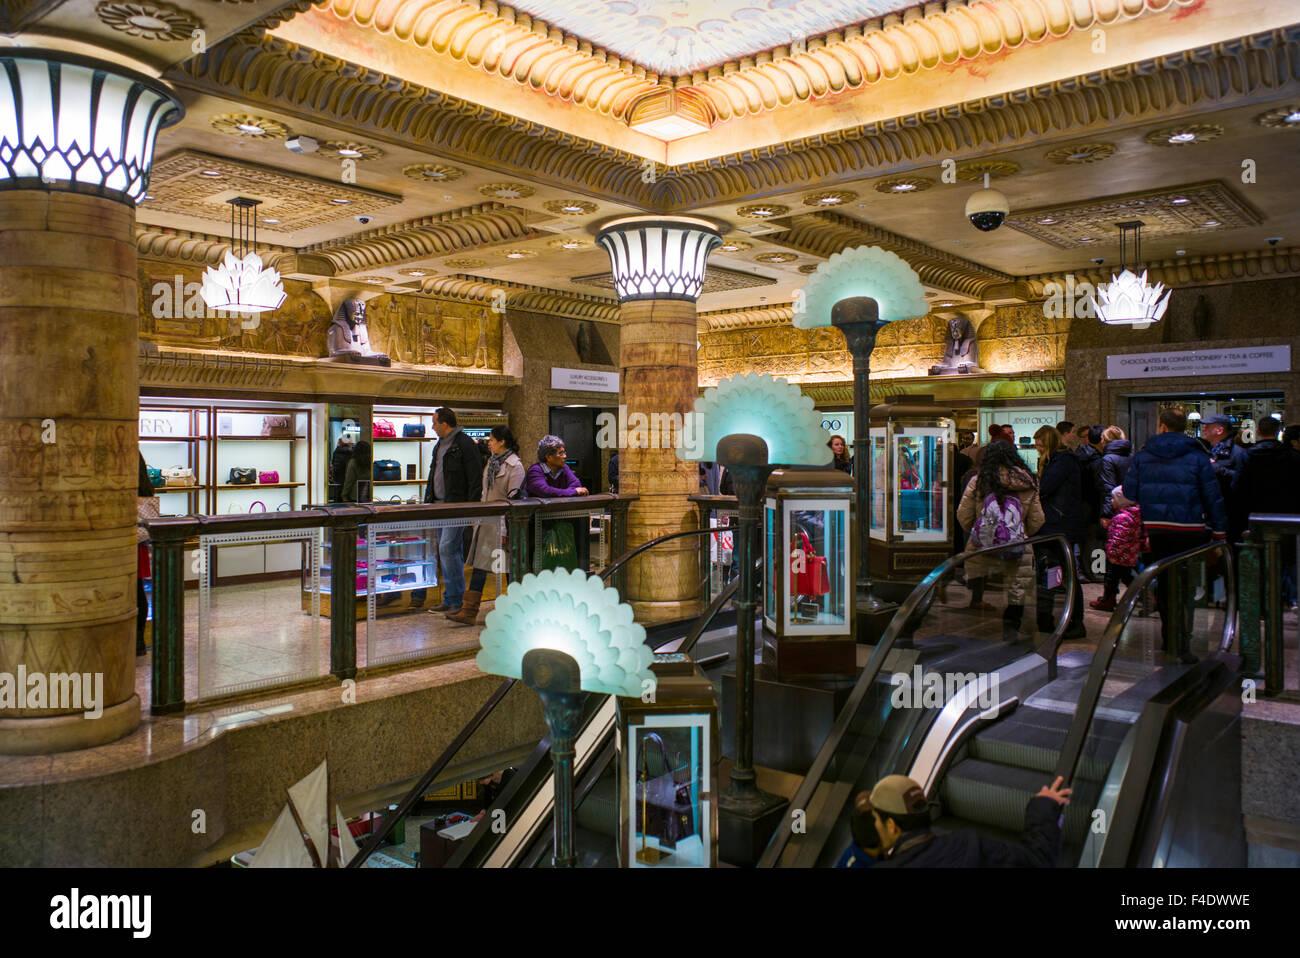 langleterre londres knightsbridge harrods department store de l intrieur